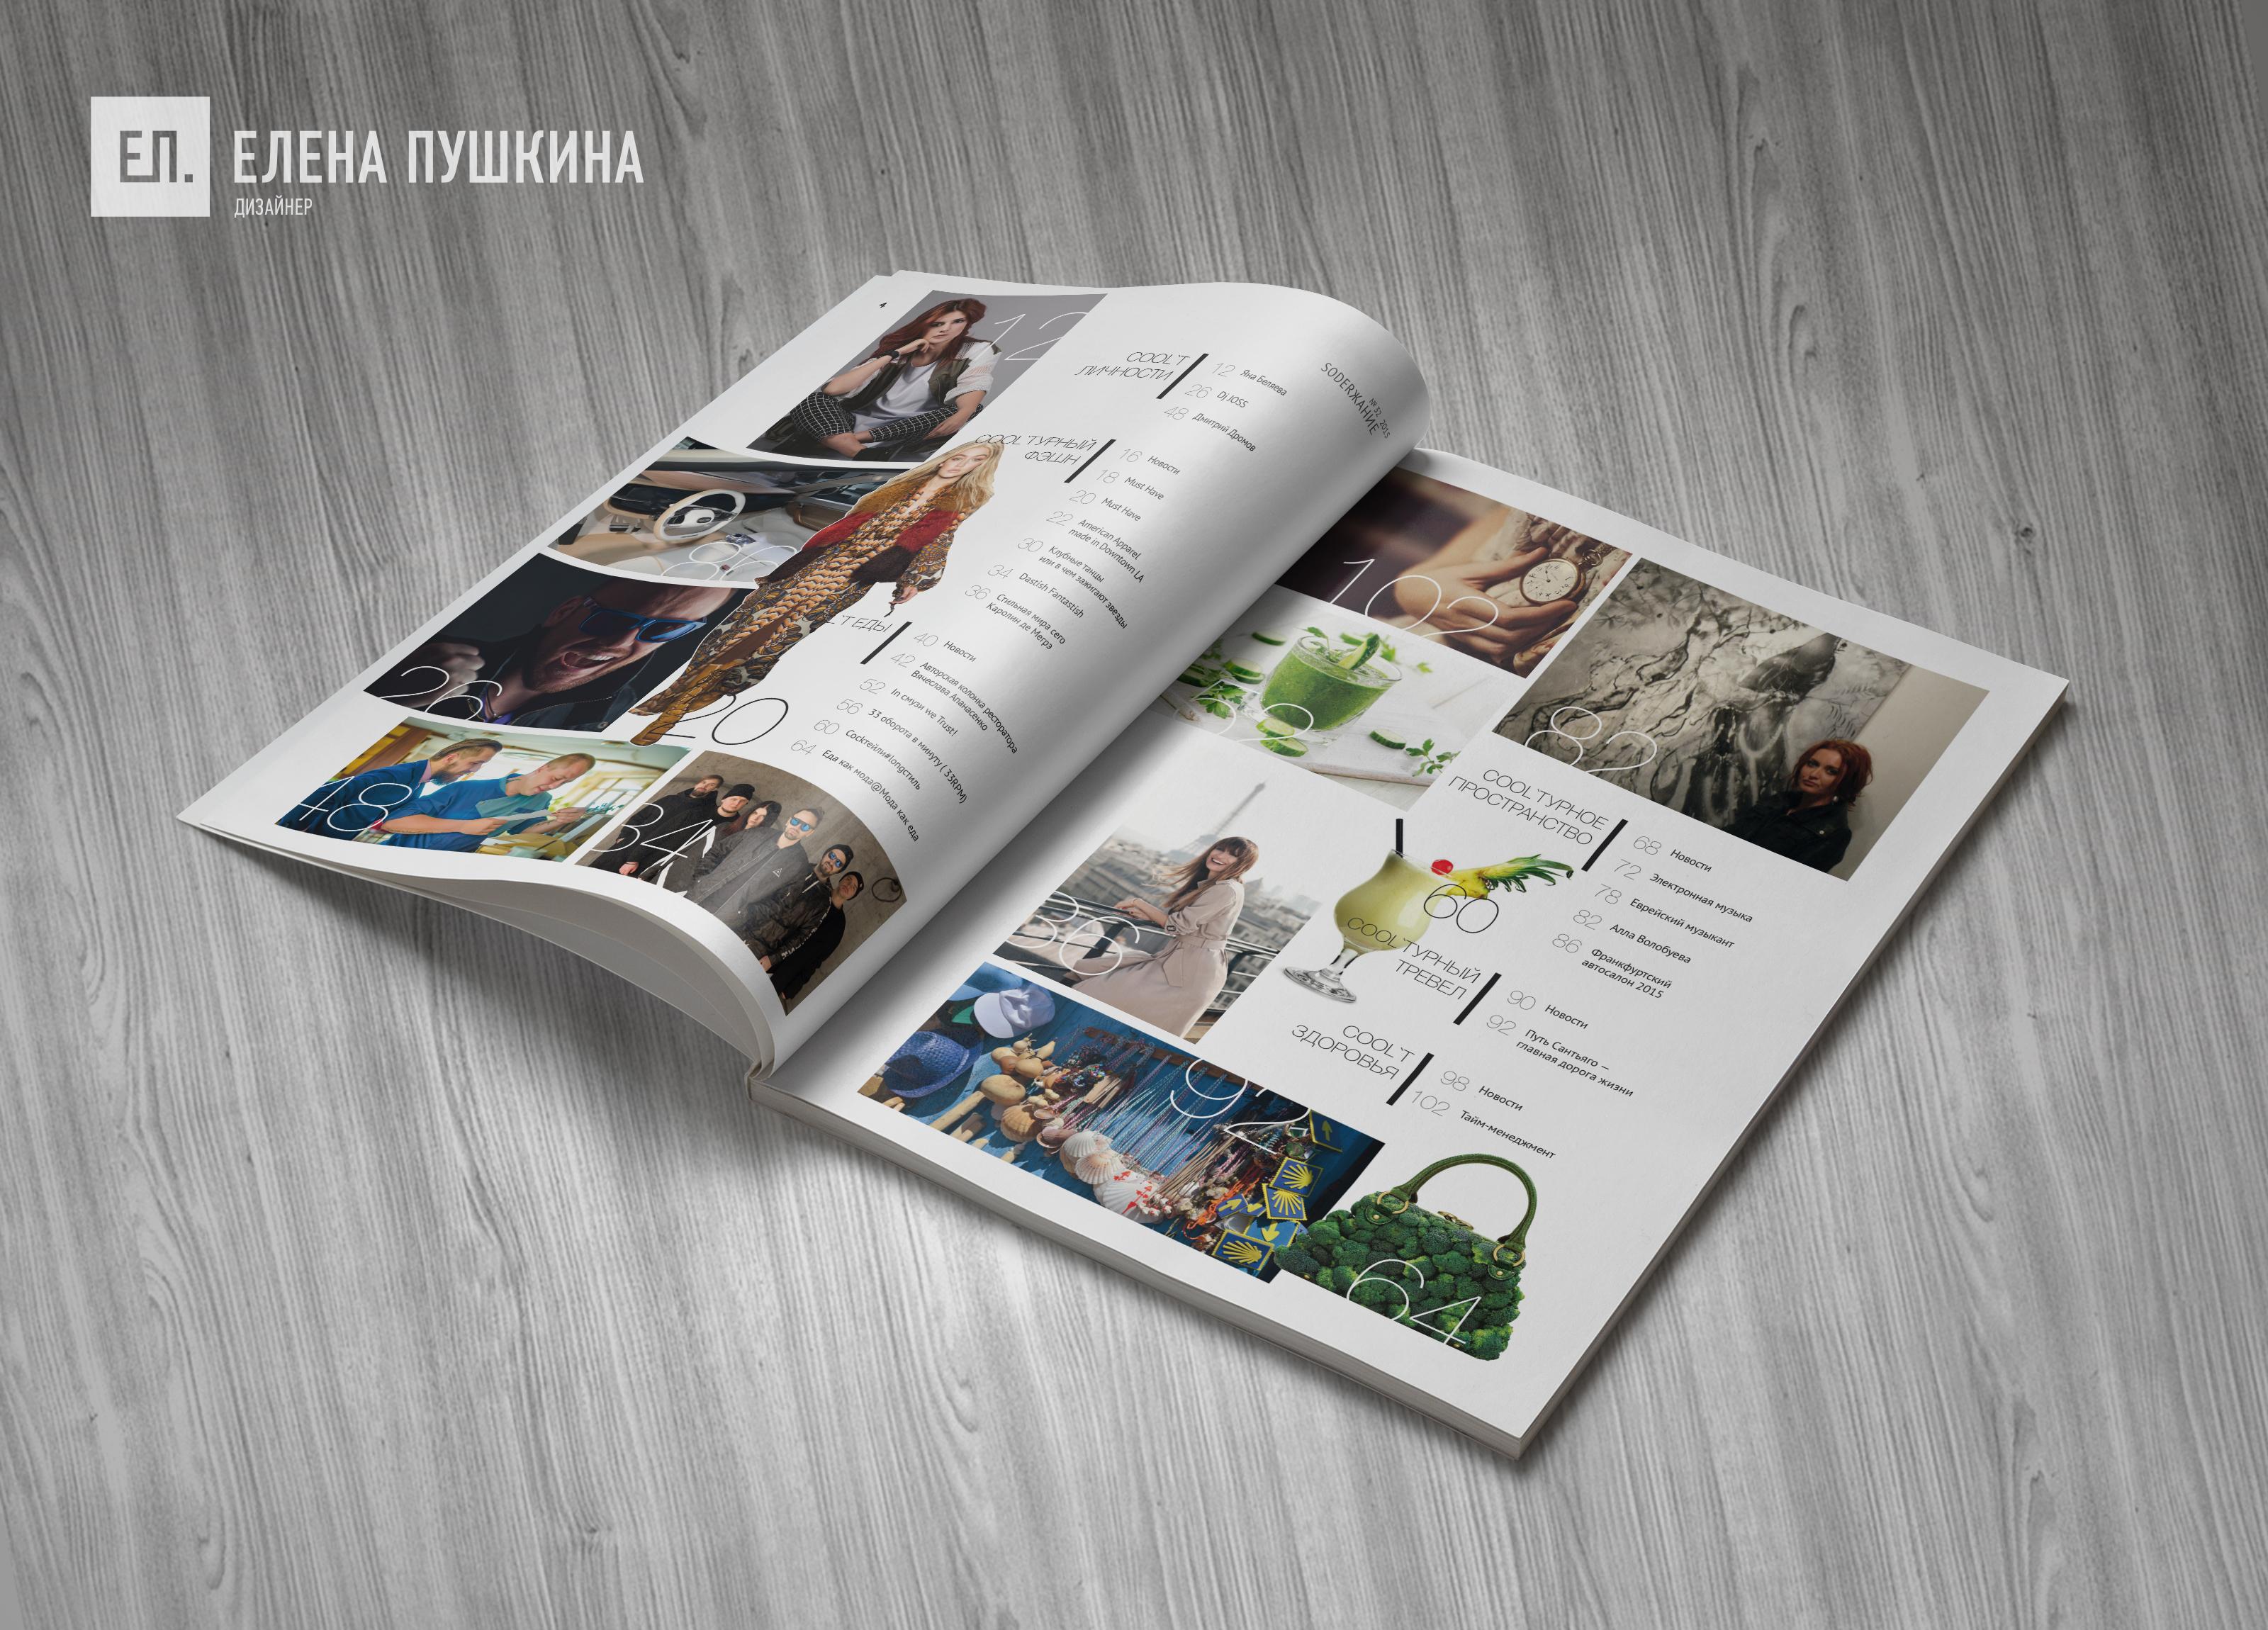 Глянцевый журнал «CoolBaba» №32 2015— разработка дизайна ивёрстка журнала Разработка журналов Портфолио